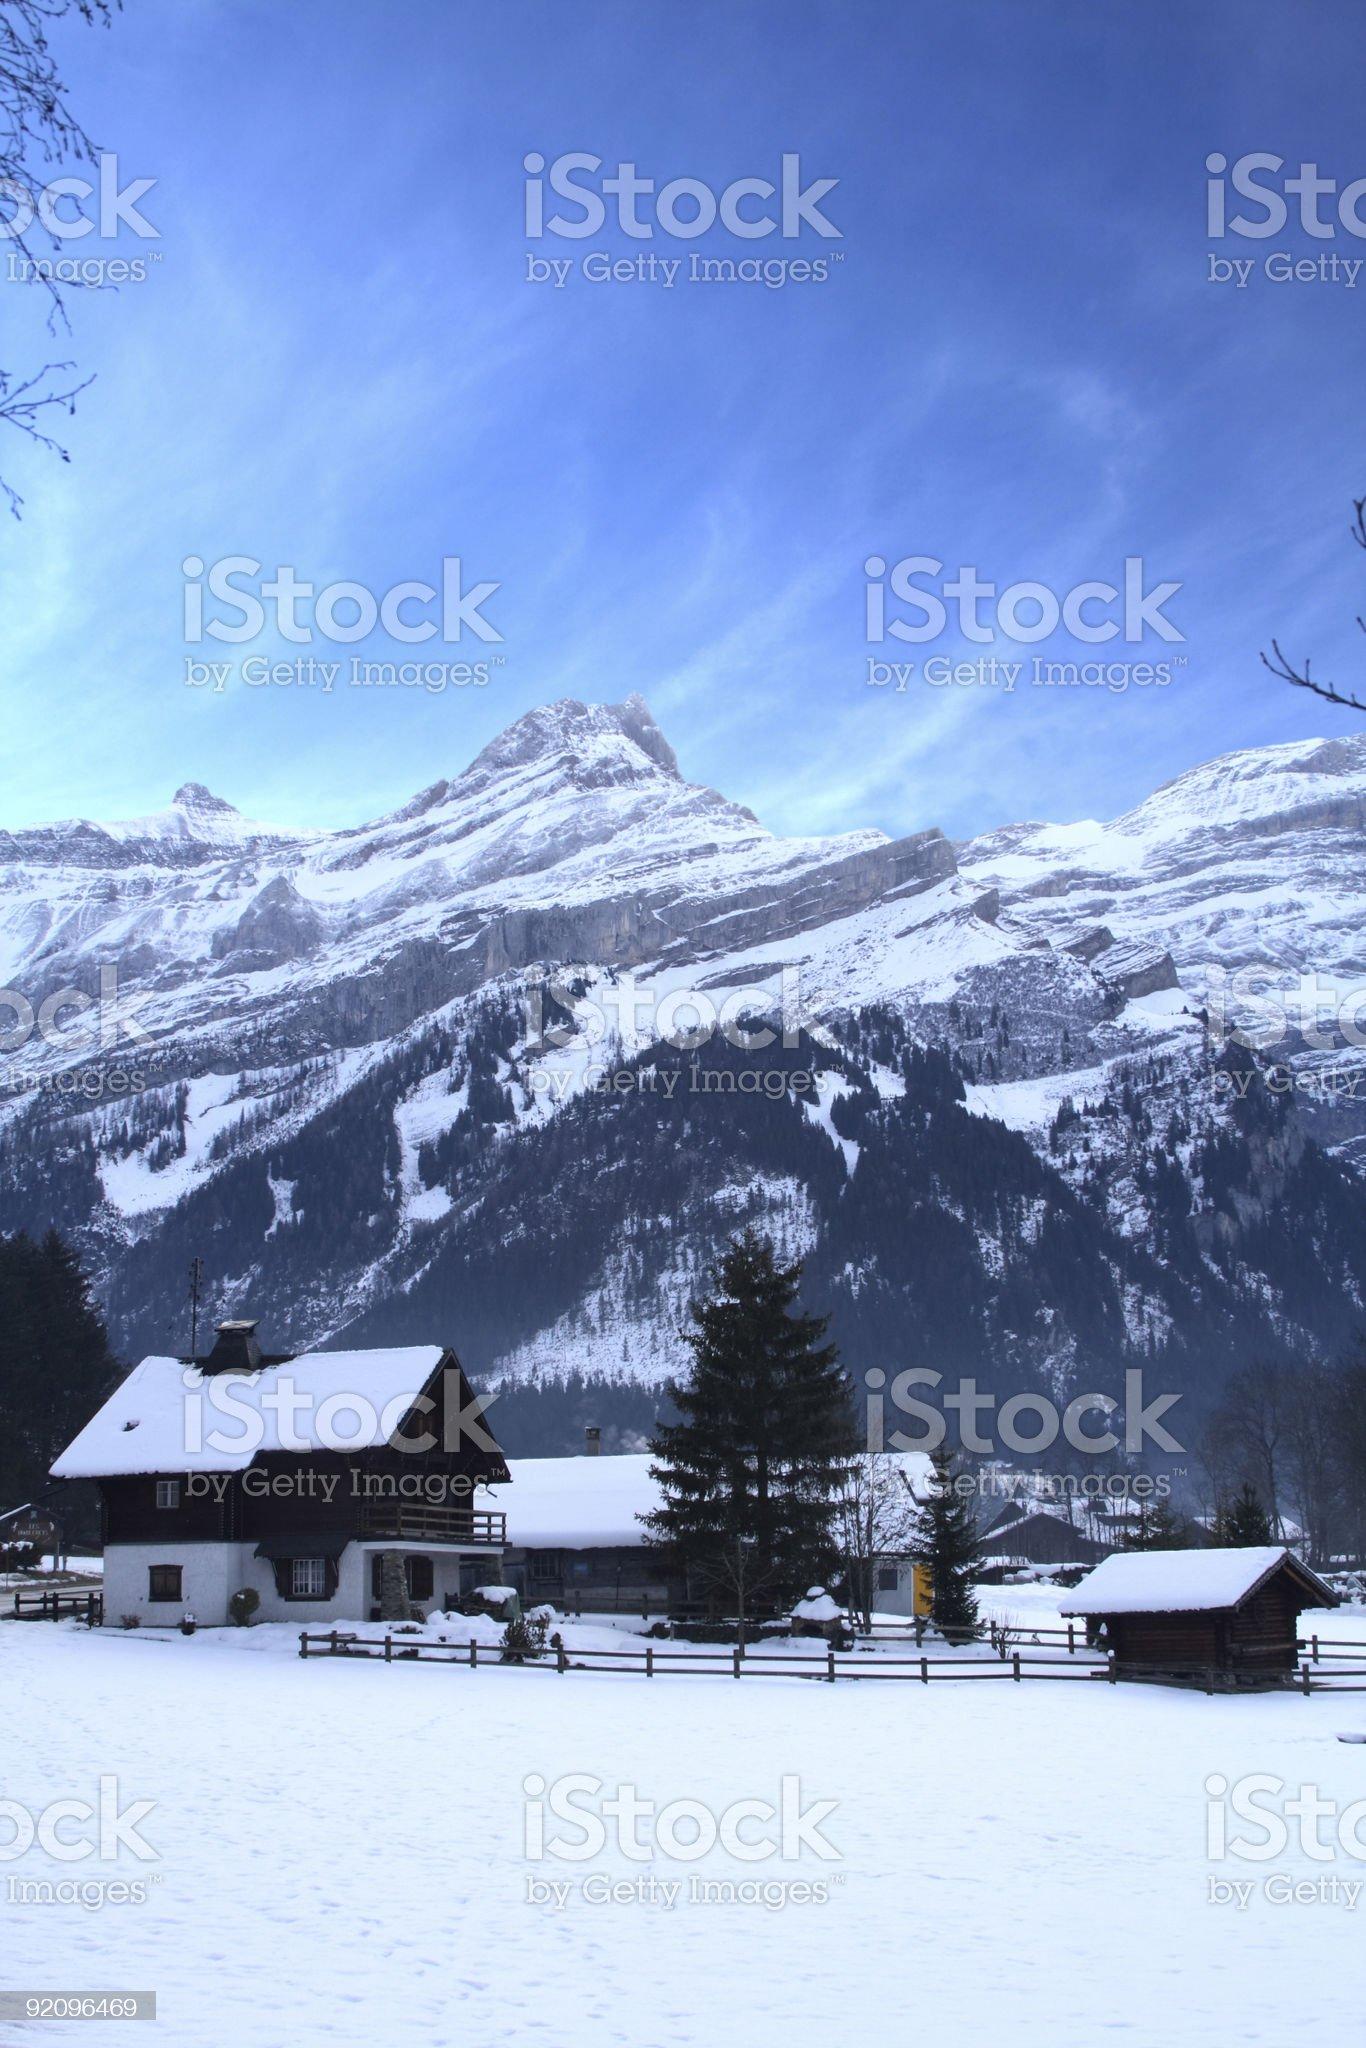 Winter Scene royalty-free stock photo